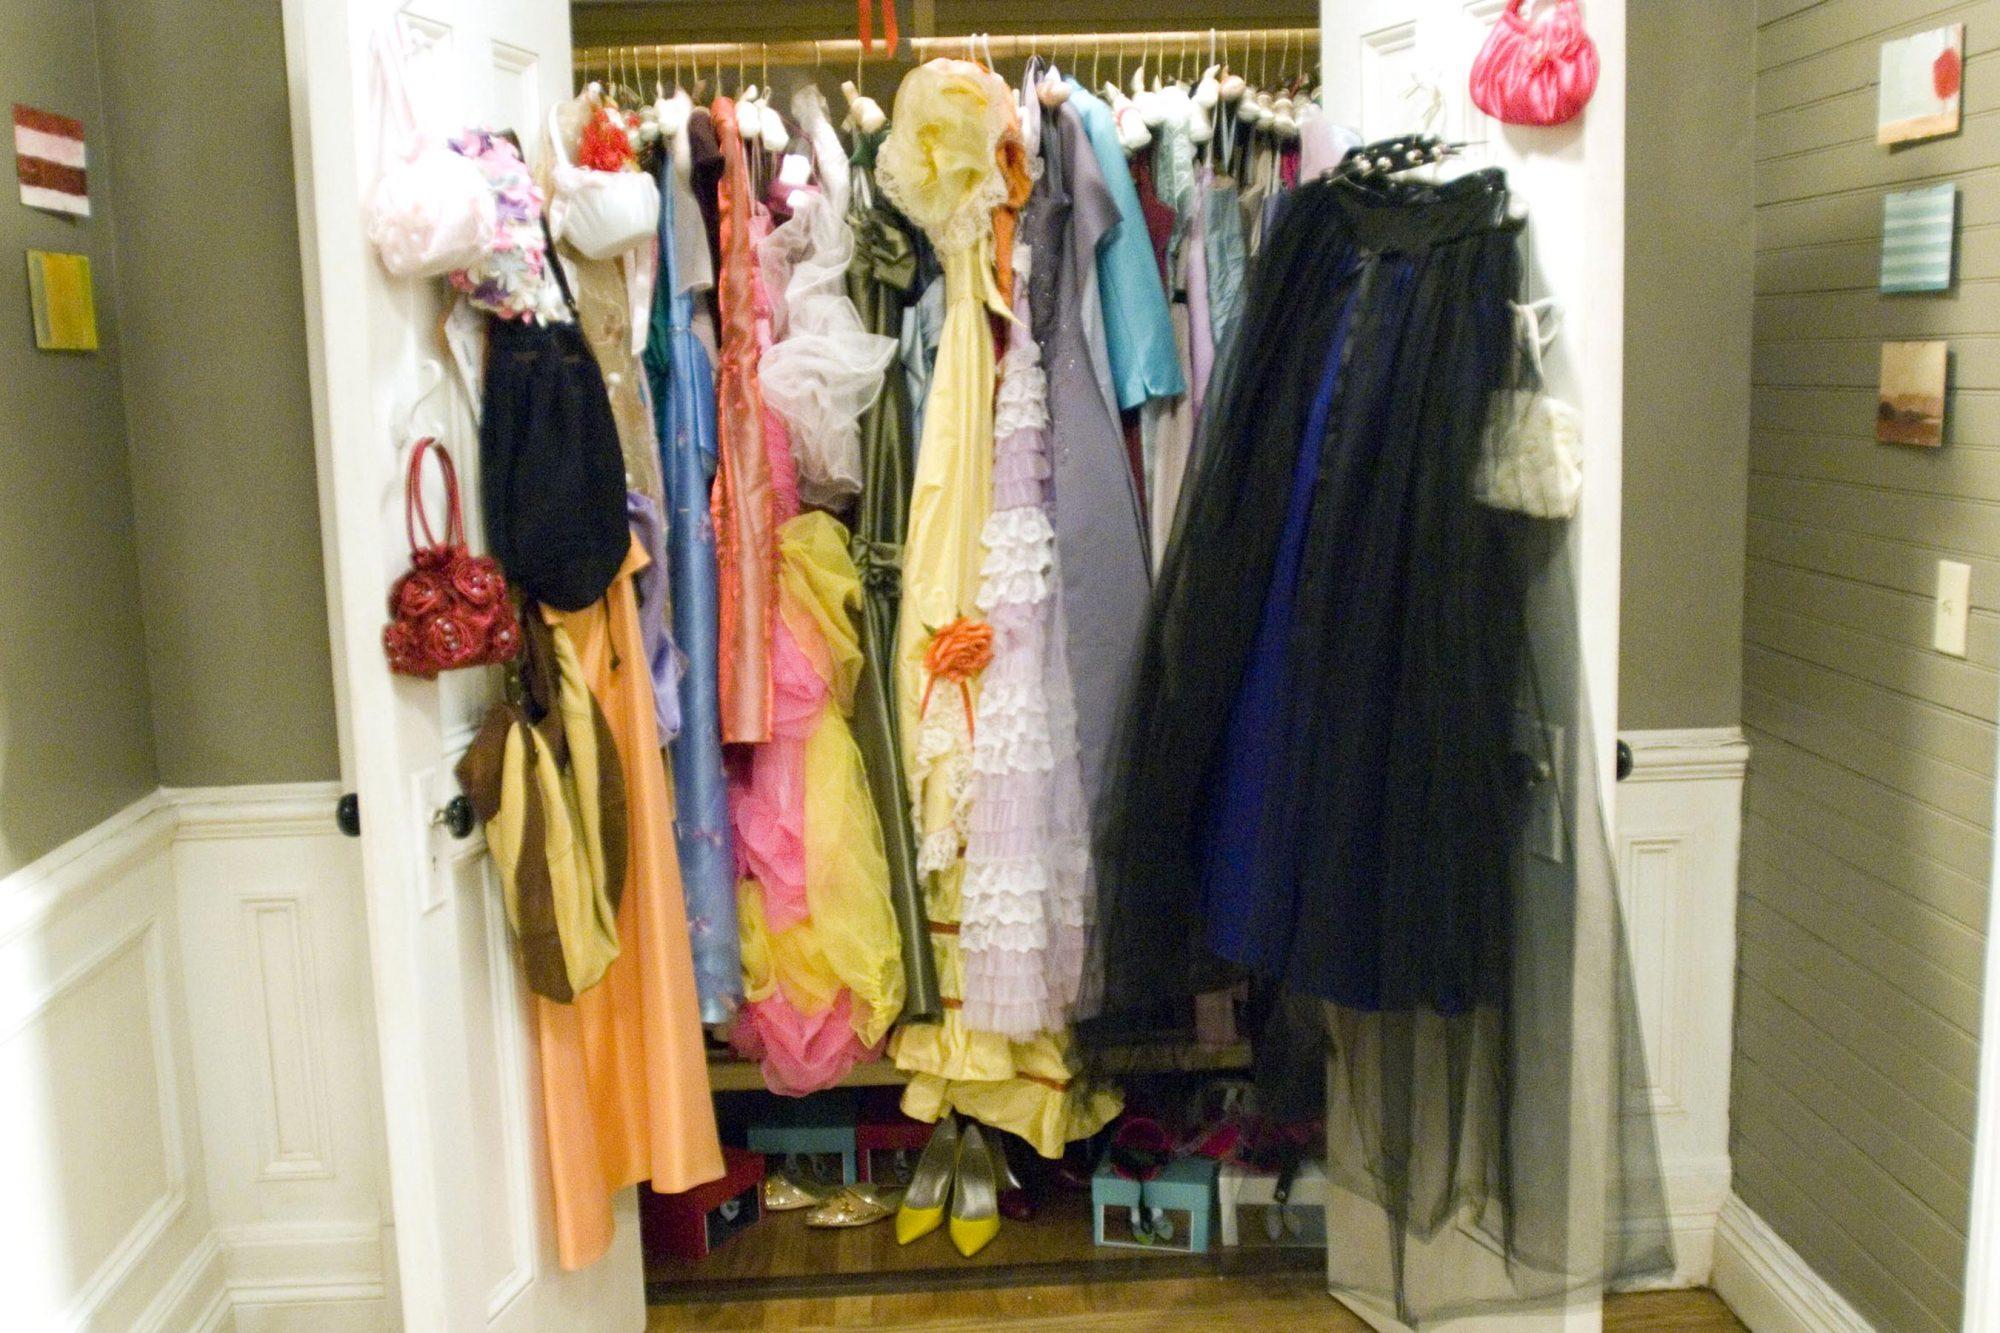 27DKS-011    A closet full of bridesmaid dresses takes cente